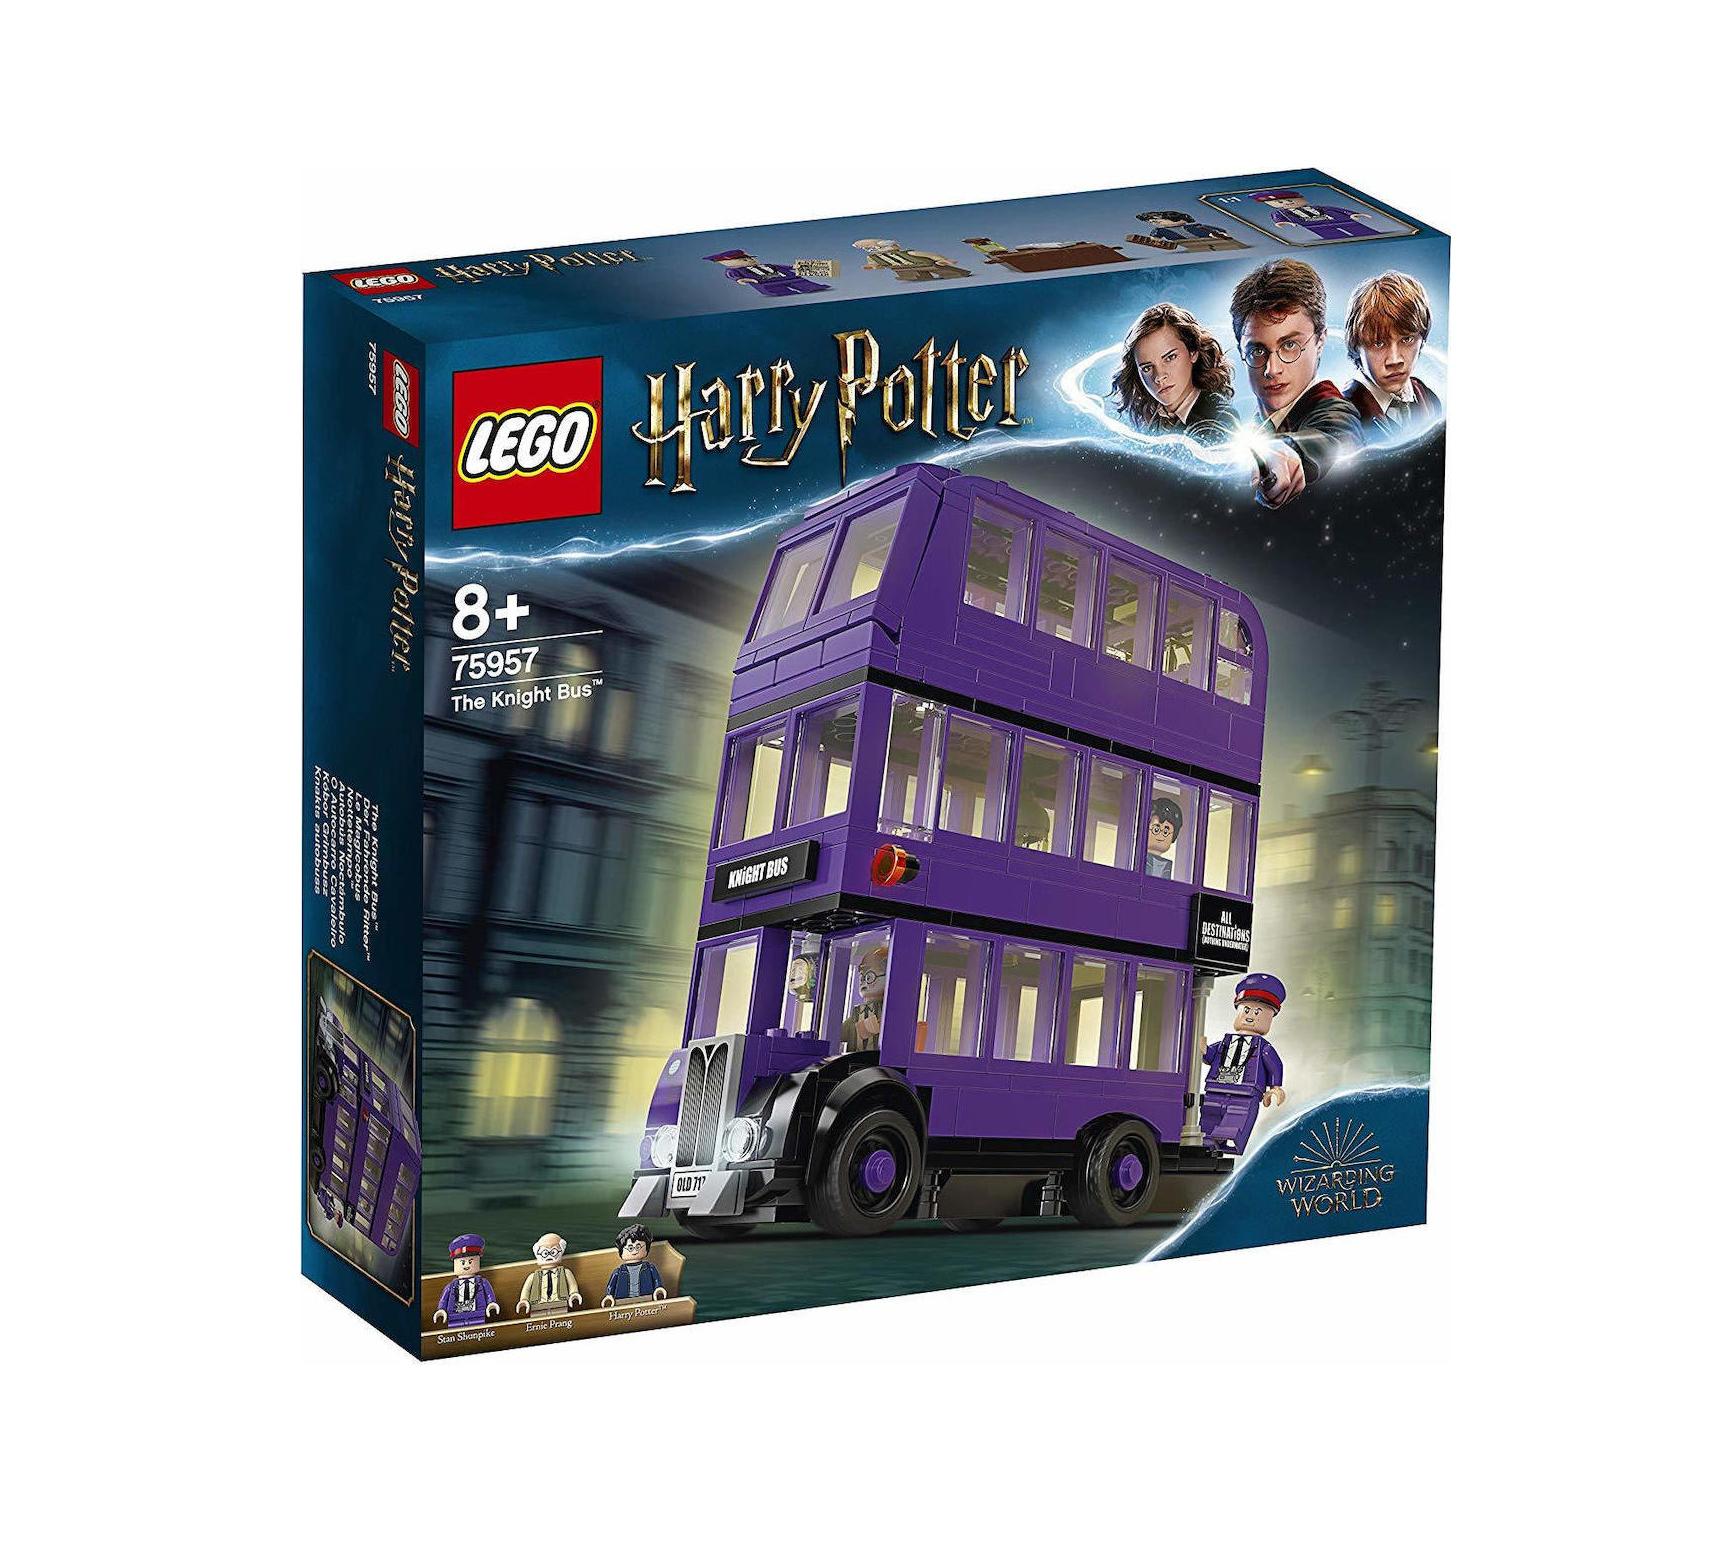 Lego Harry Potter: The Knight Bus 75957